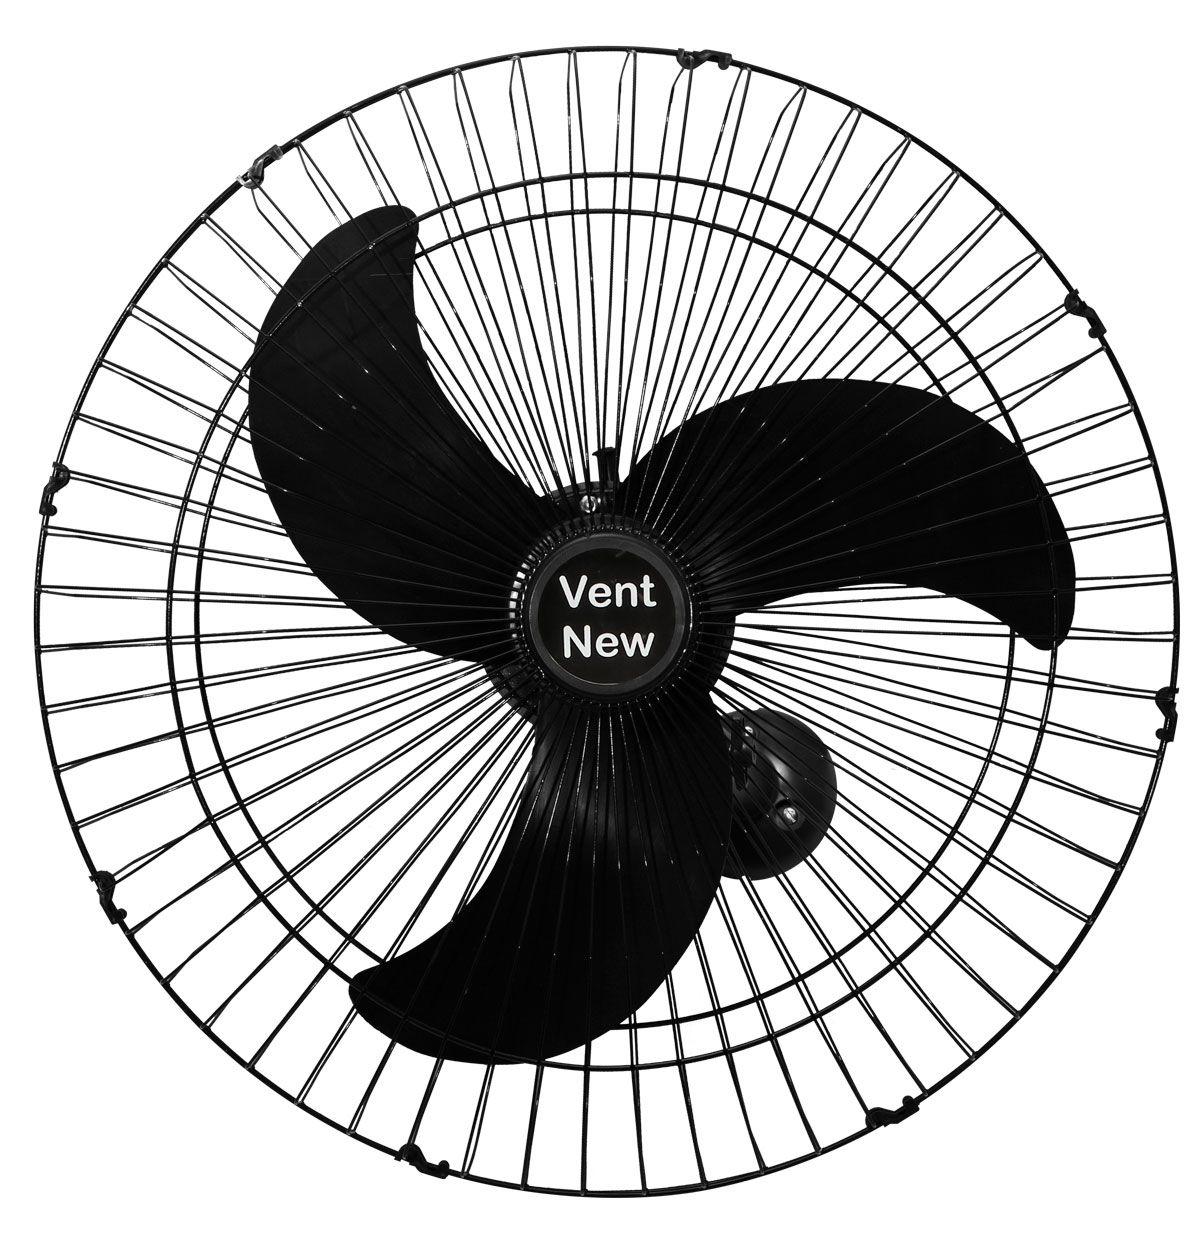 Kit 5 Ventiladores Parede Bivolt Preto Oscilante 60 Cm